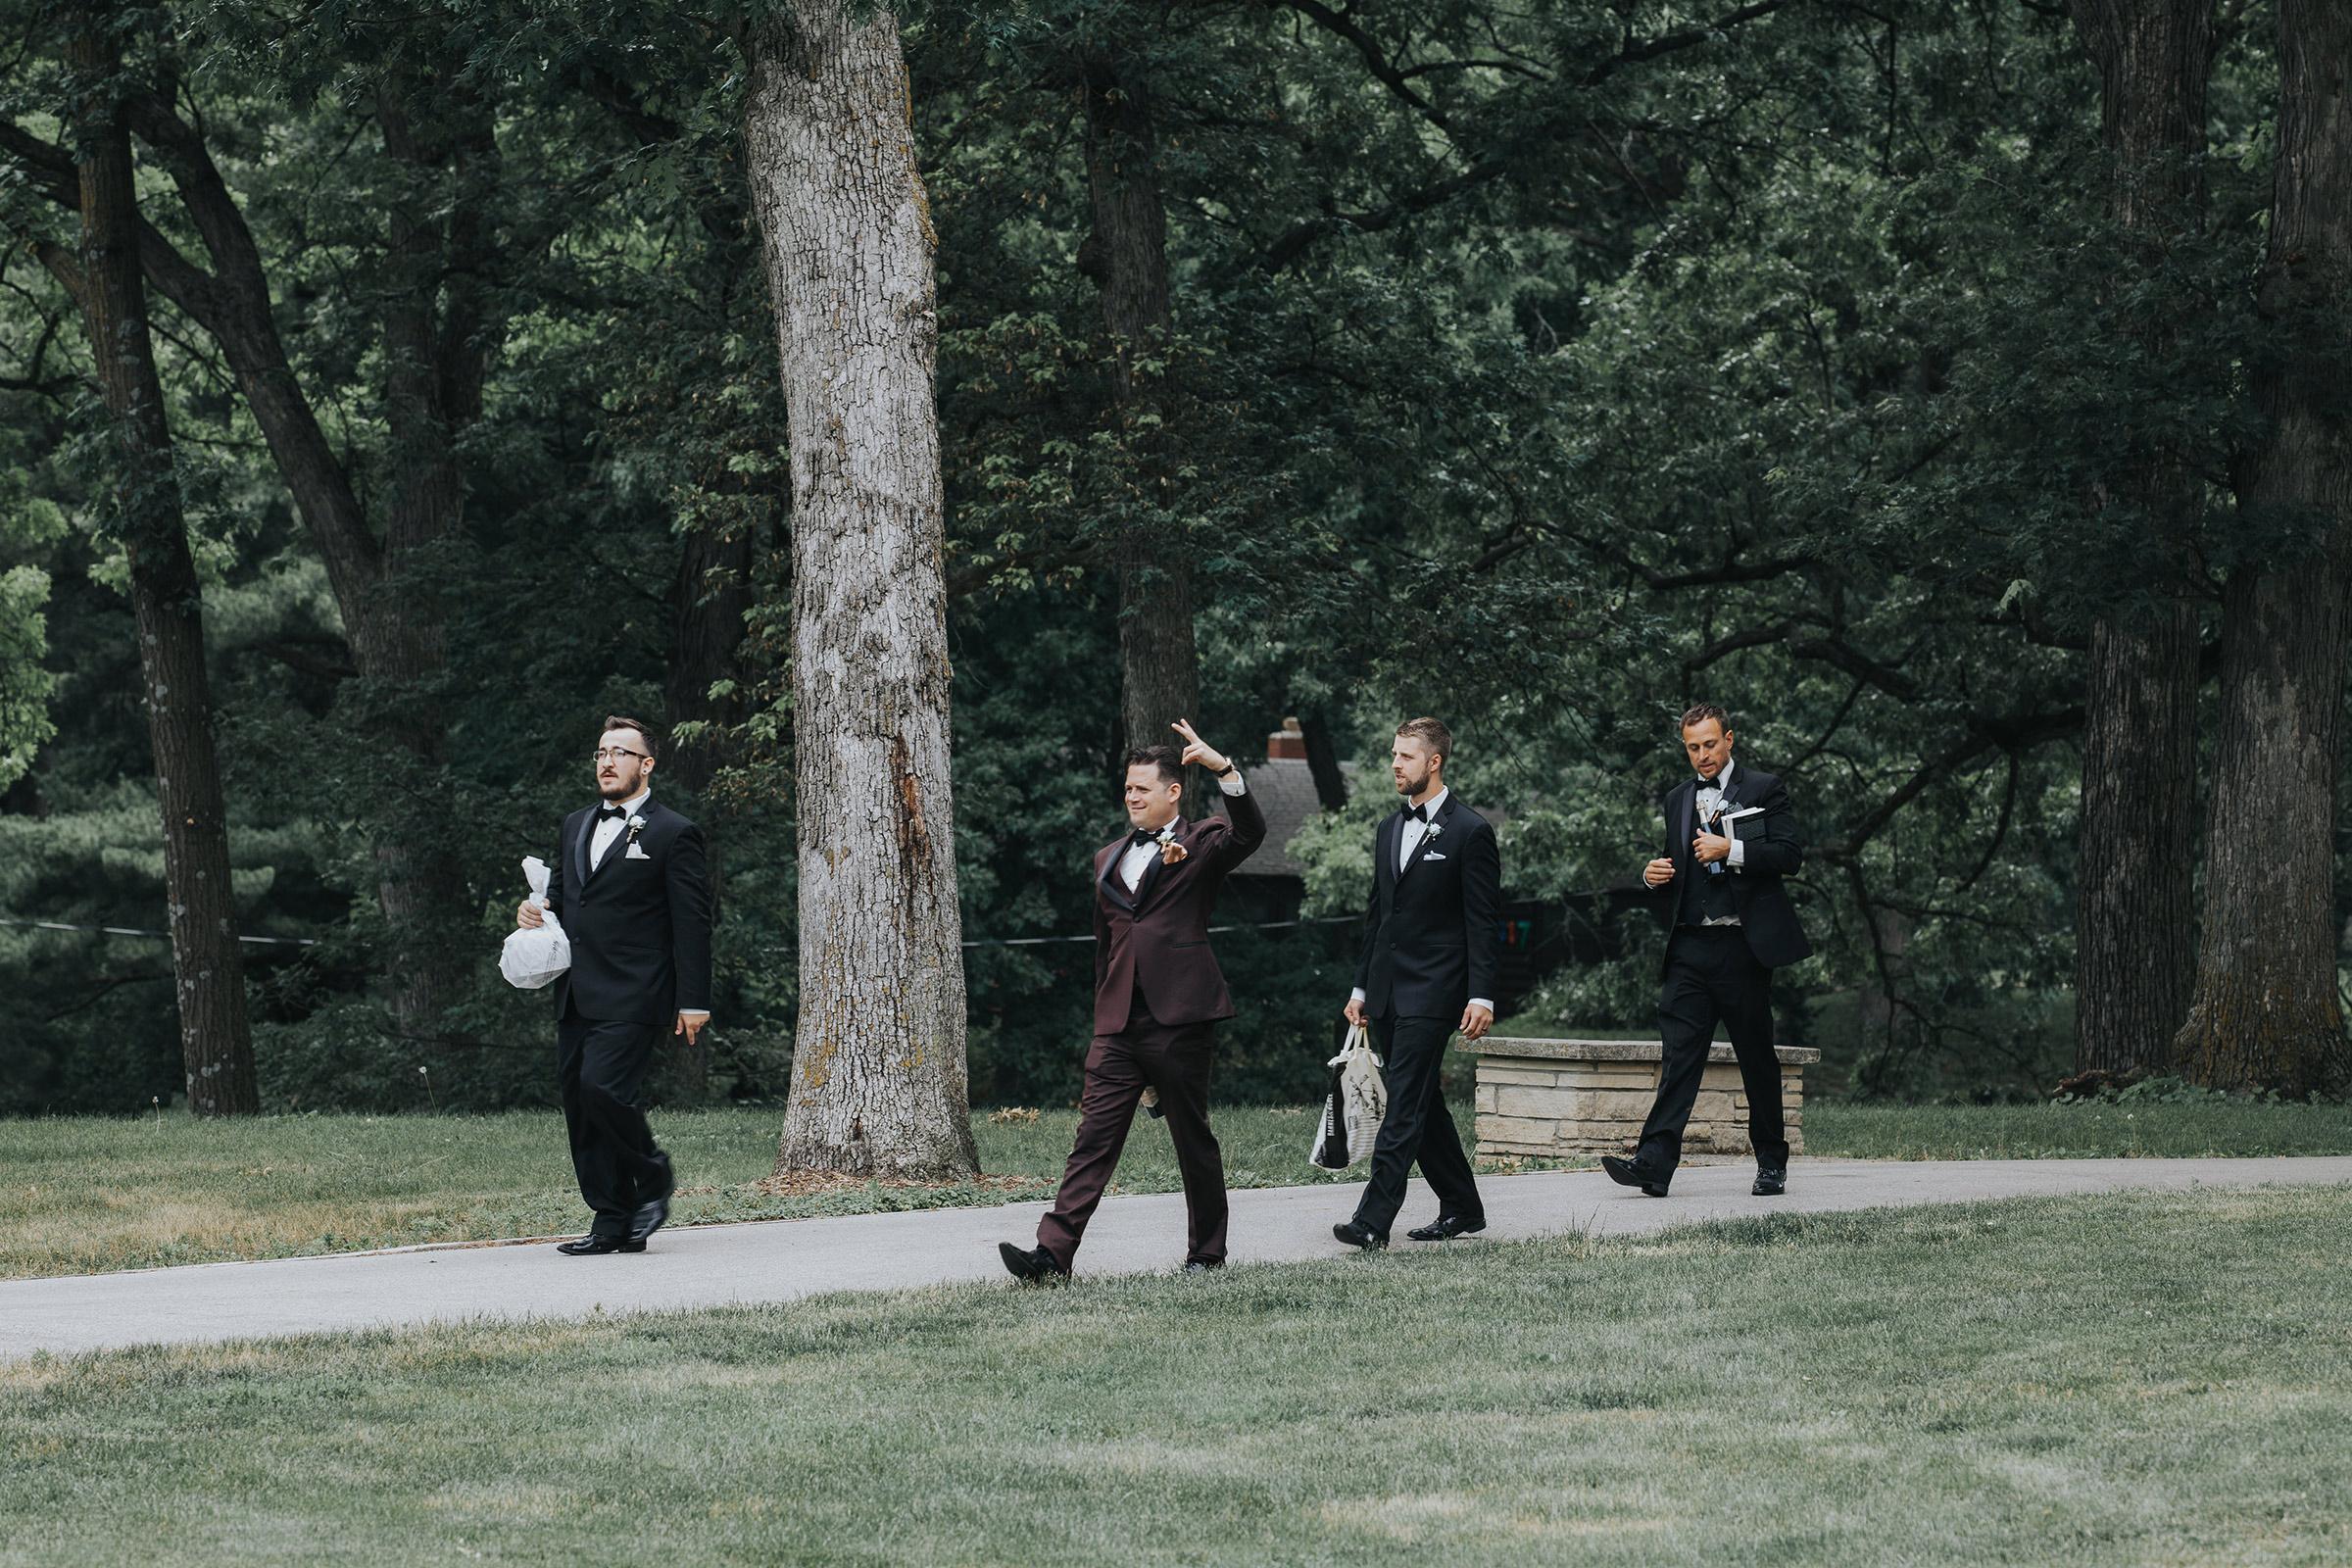 groom-arriving-to-ceremony-desmoines-iowa-rose-garden-raelyn-ramey-photography.jpg